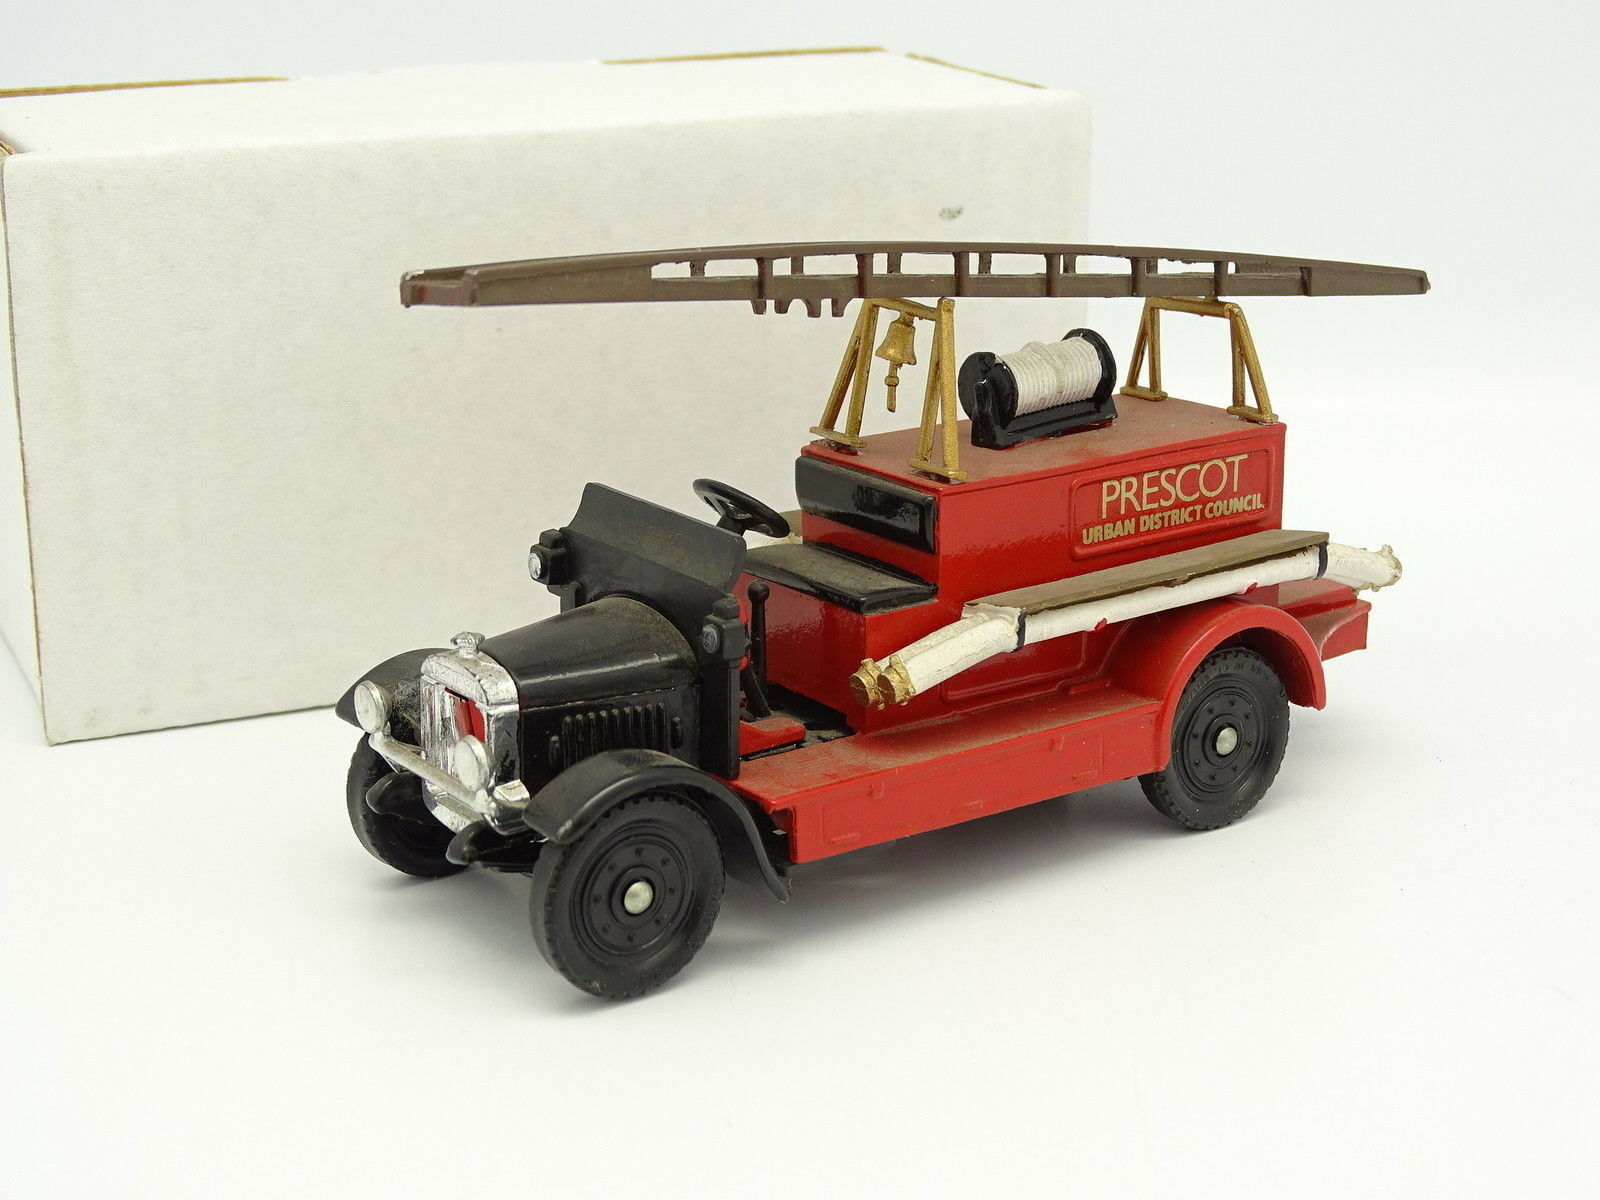 Kit Montato Base Corgi 1 43 - Camion Pompieri Fire Engine Prescot